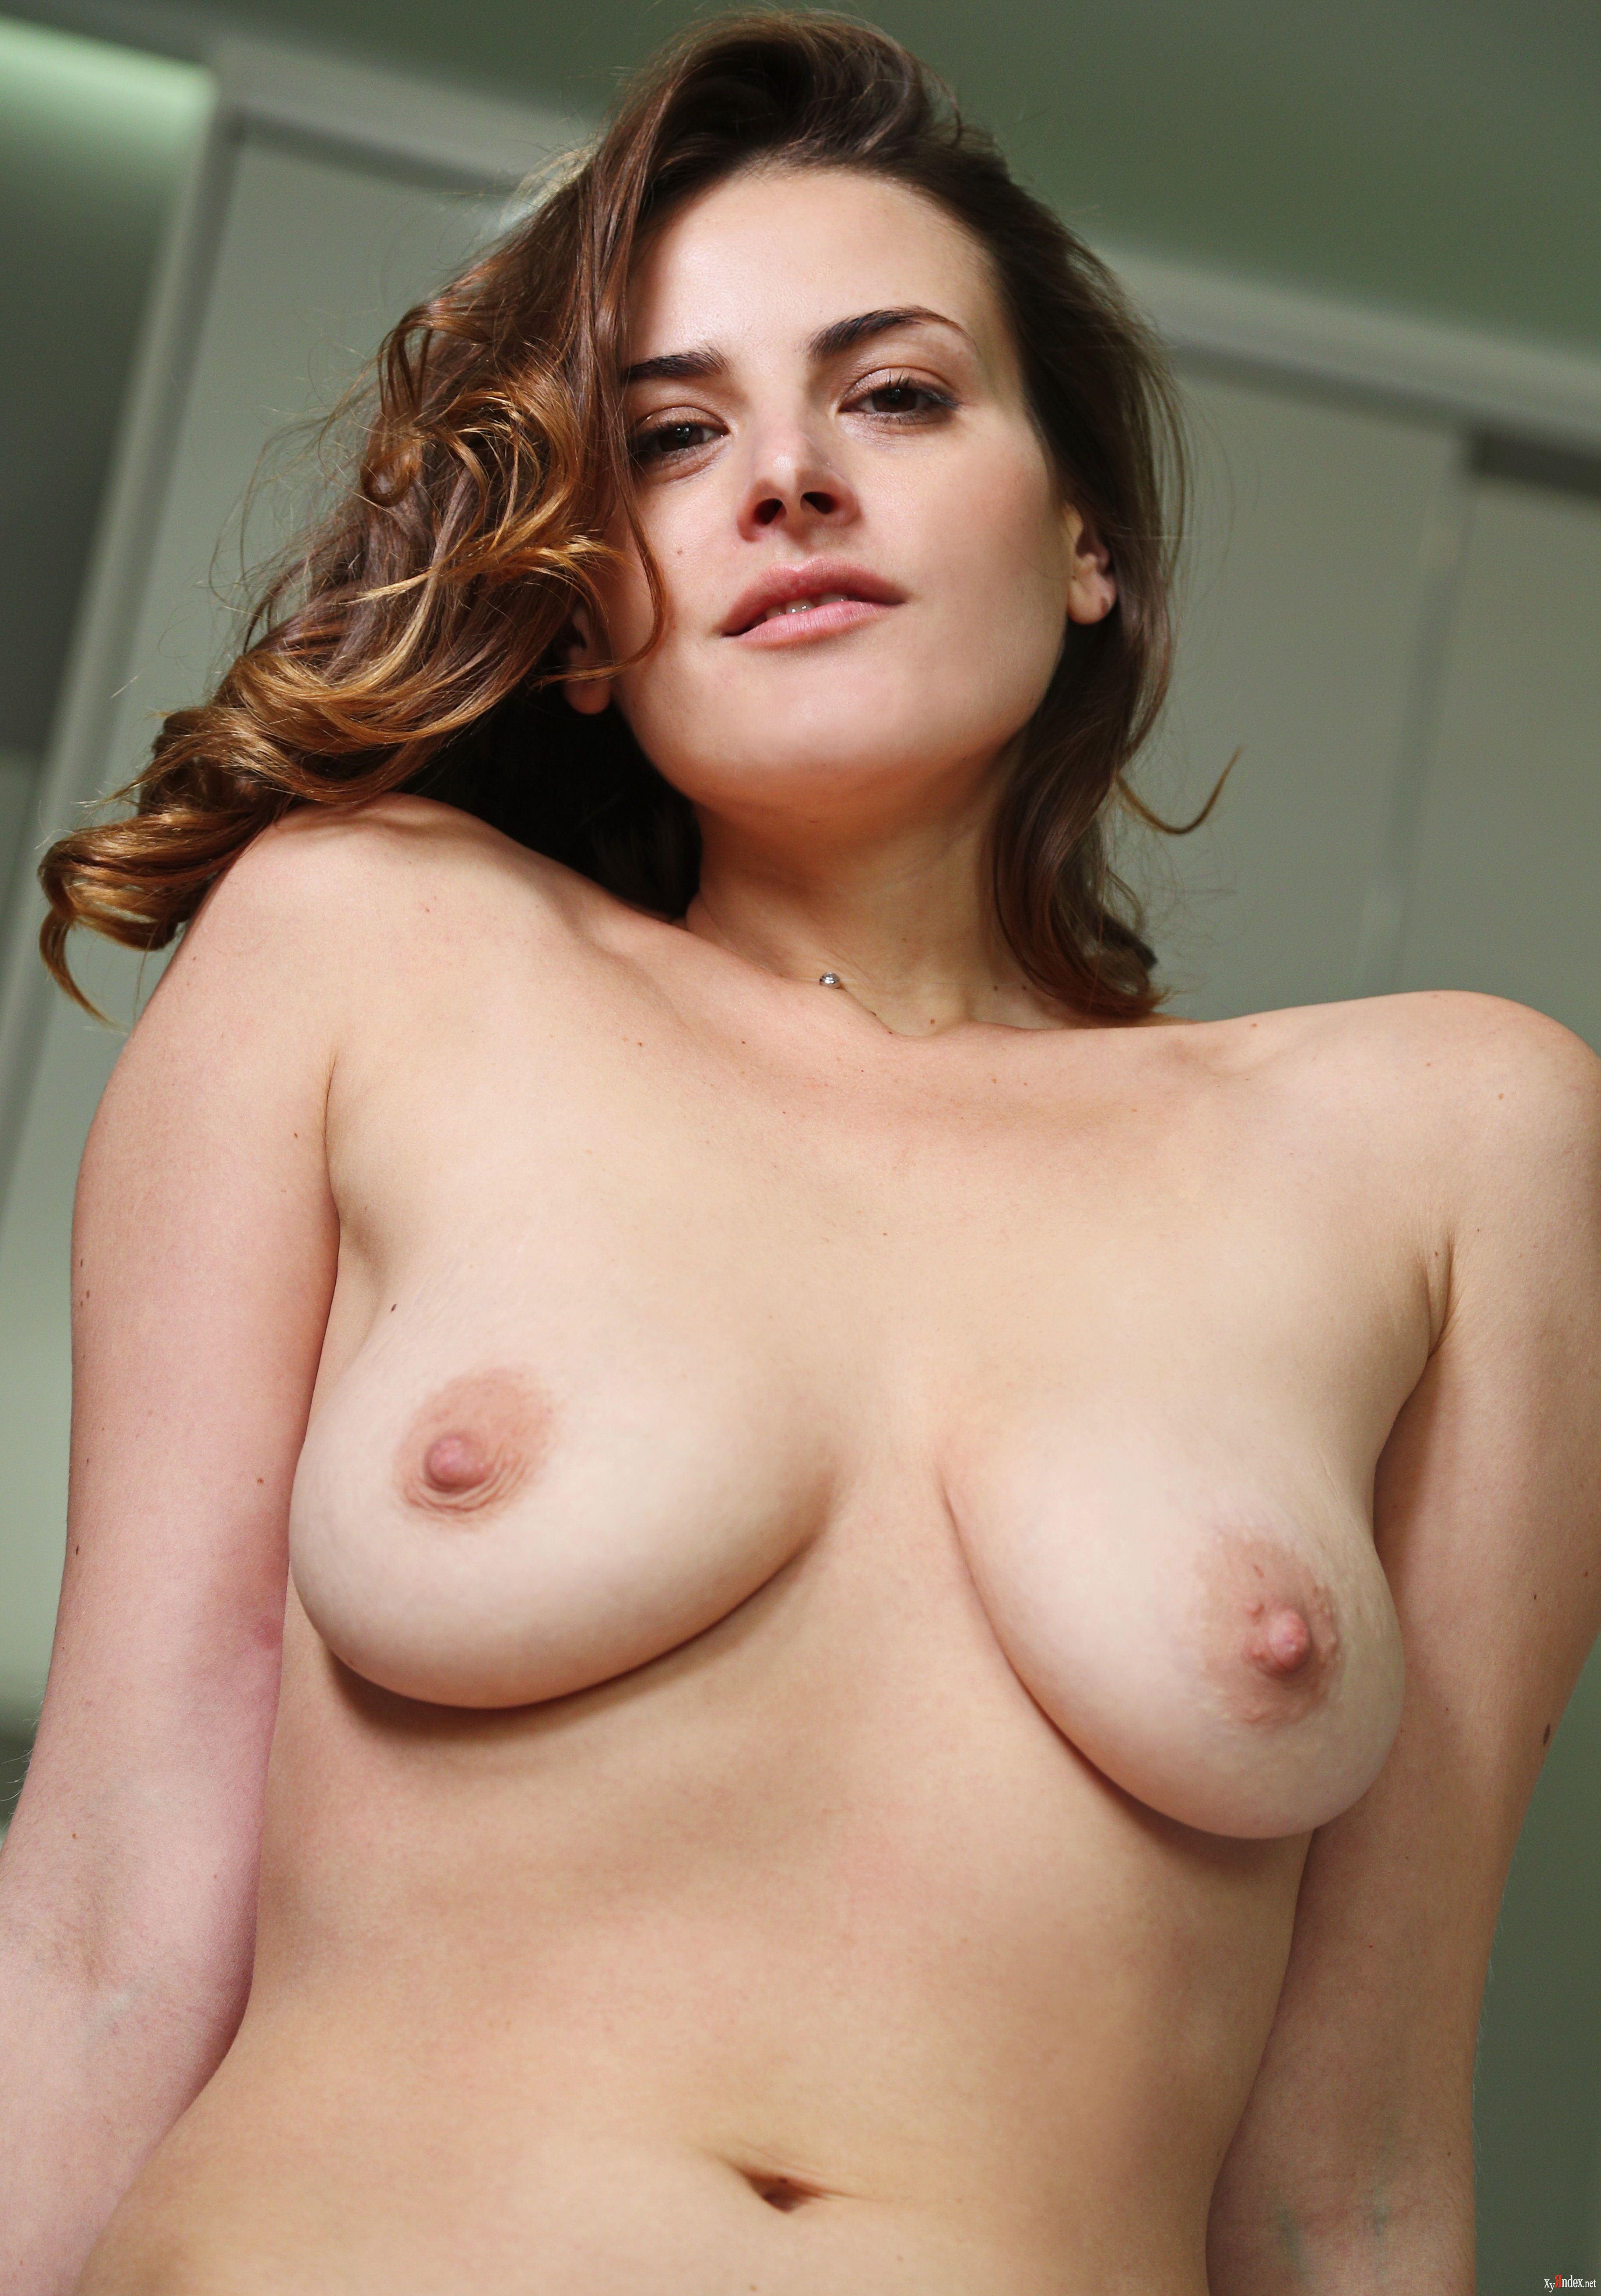 Evangelina wish nude and curvy